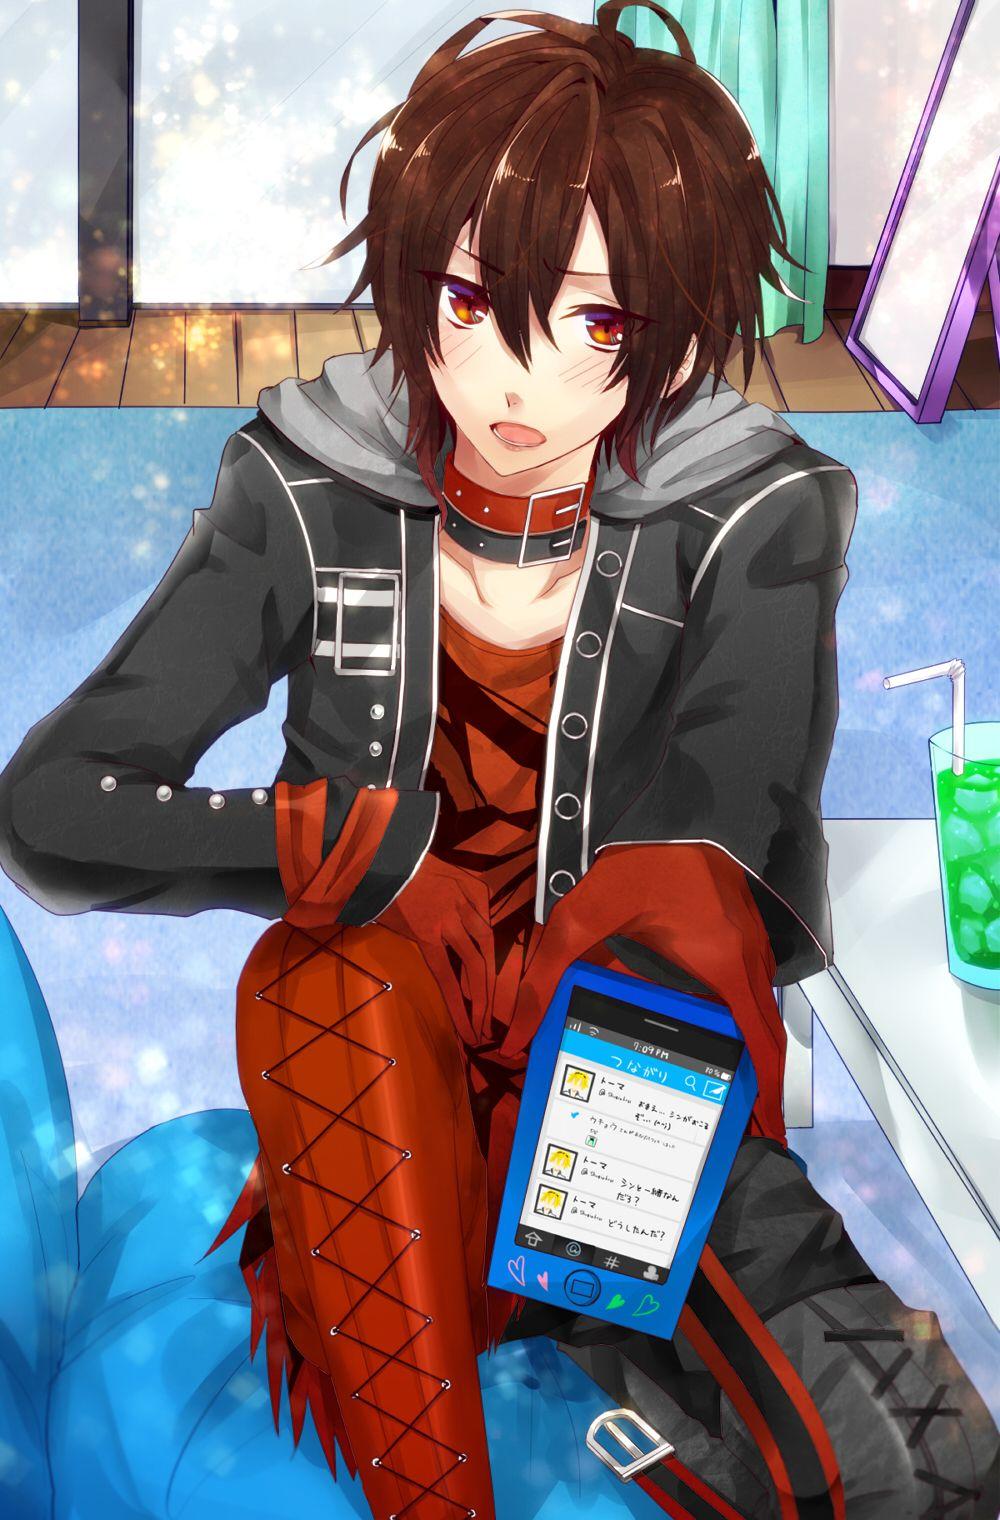 Anime guy. I think he's from uta no prince sama?? I don't